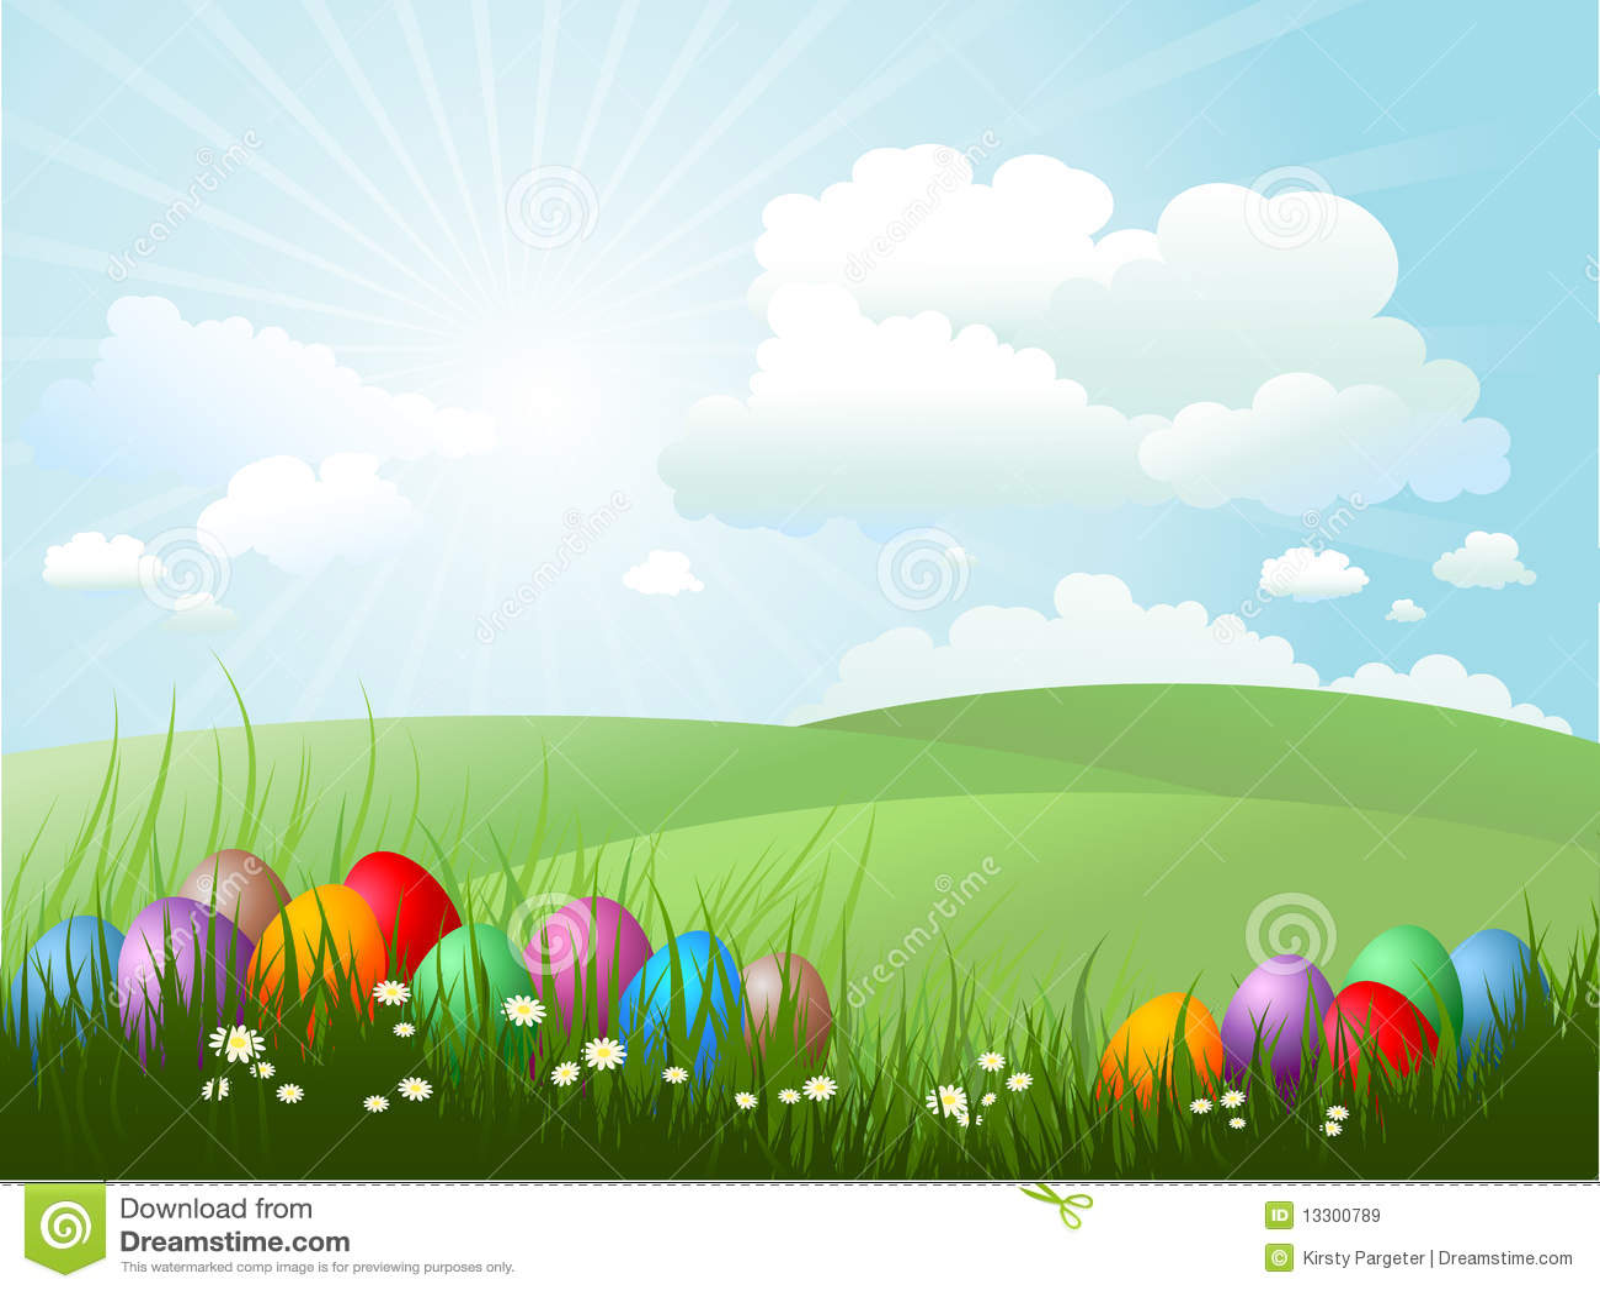 Easter Eggs In Grass Stock Vector. Illustration Of